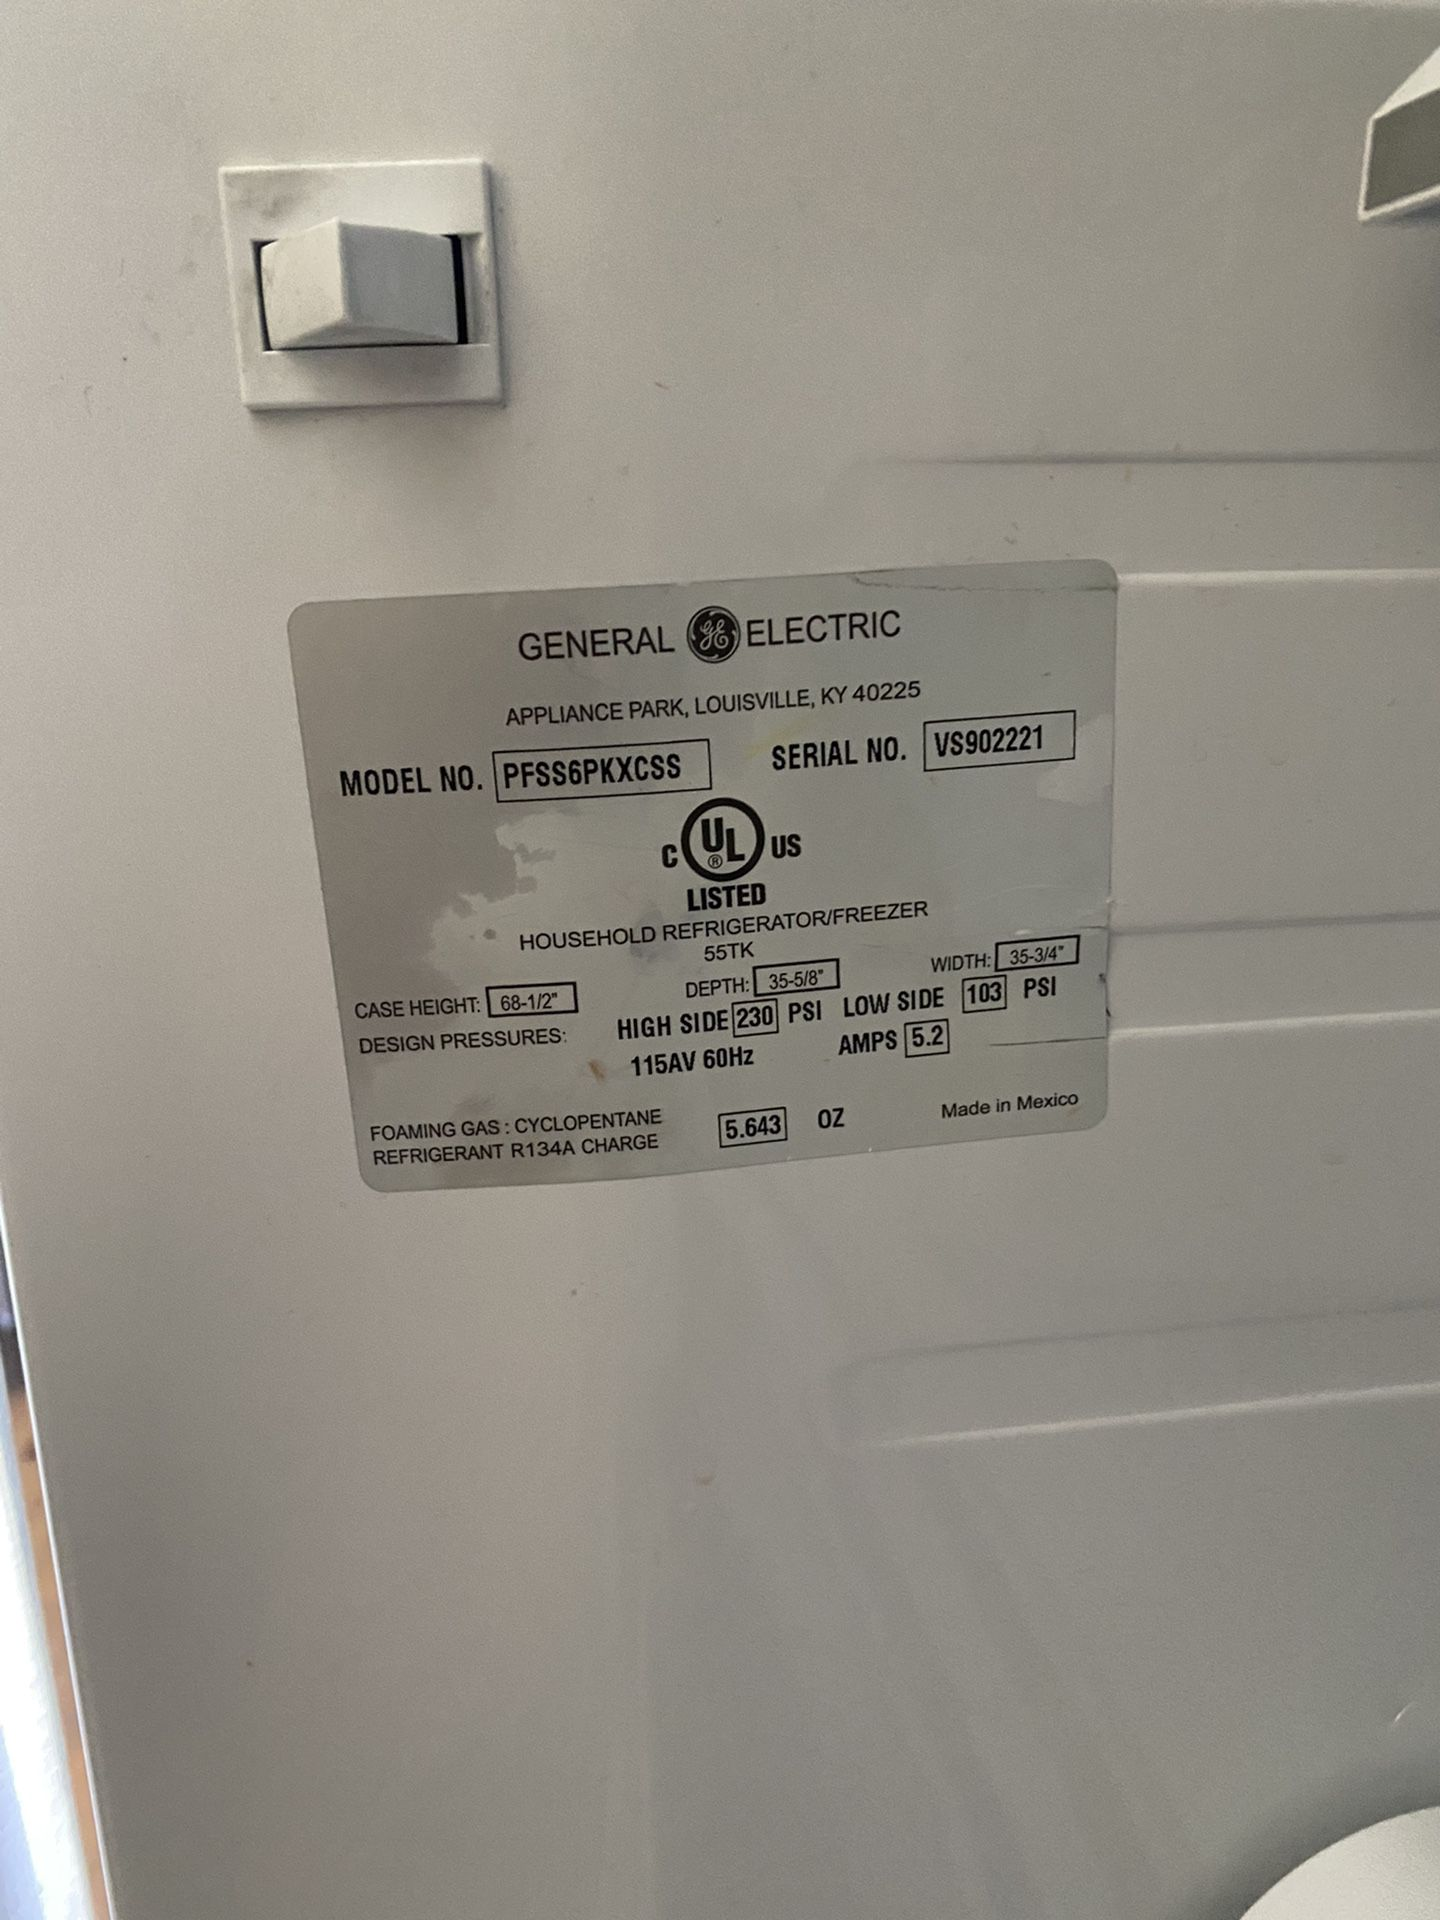 GE Energy Star 25.8 Cu. Ft. French-door Refrigerator